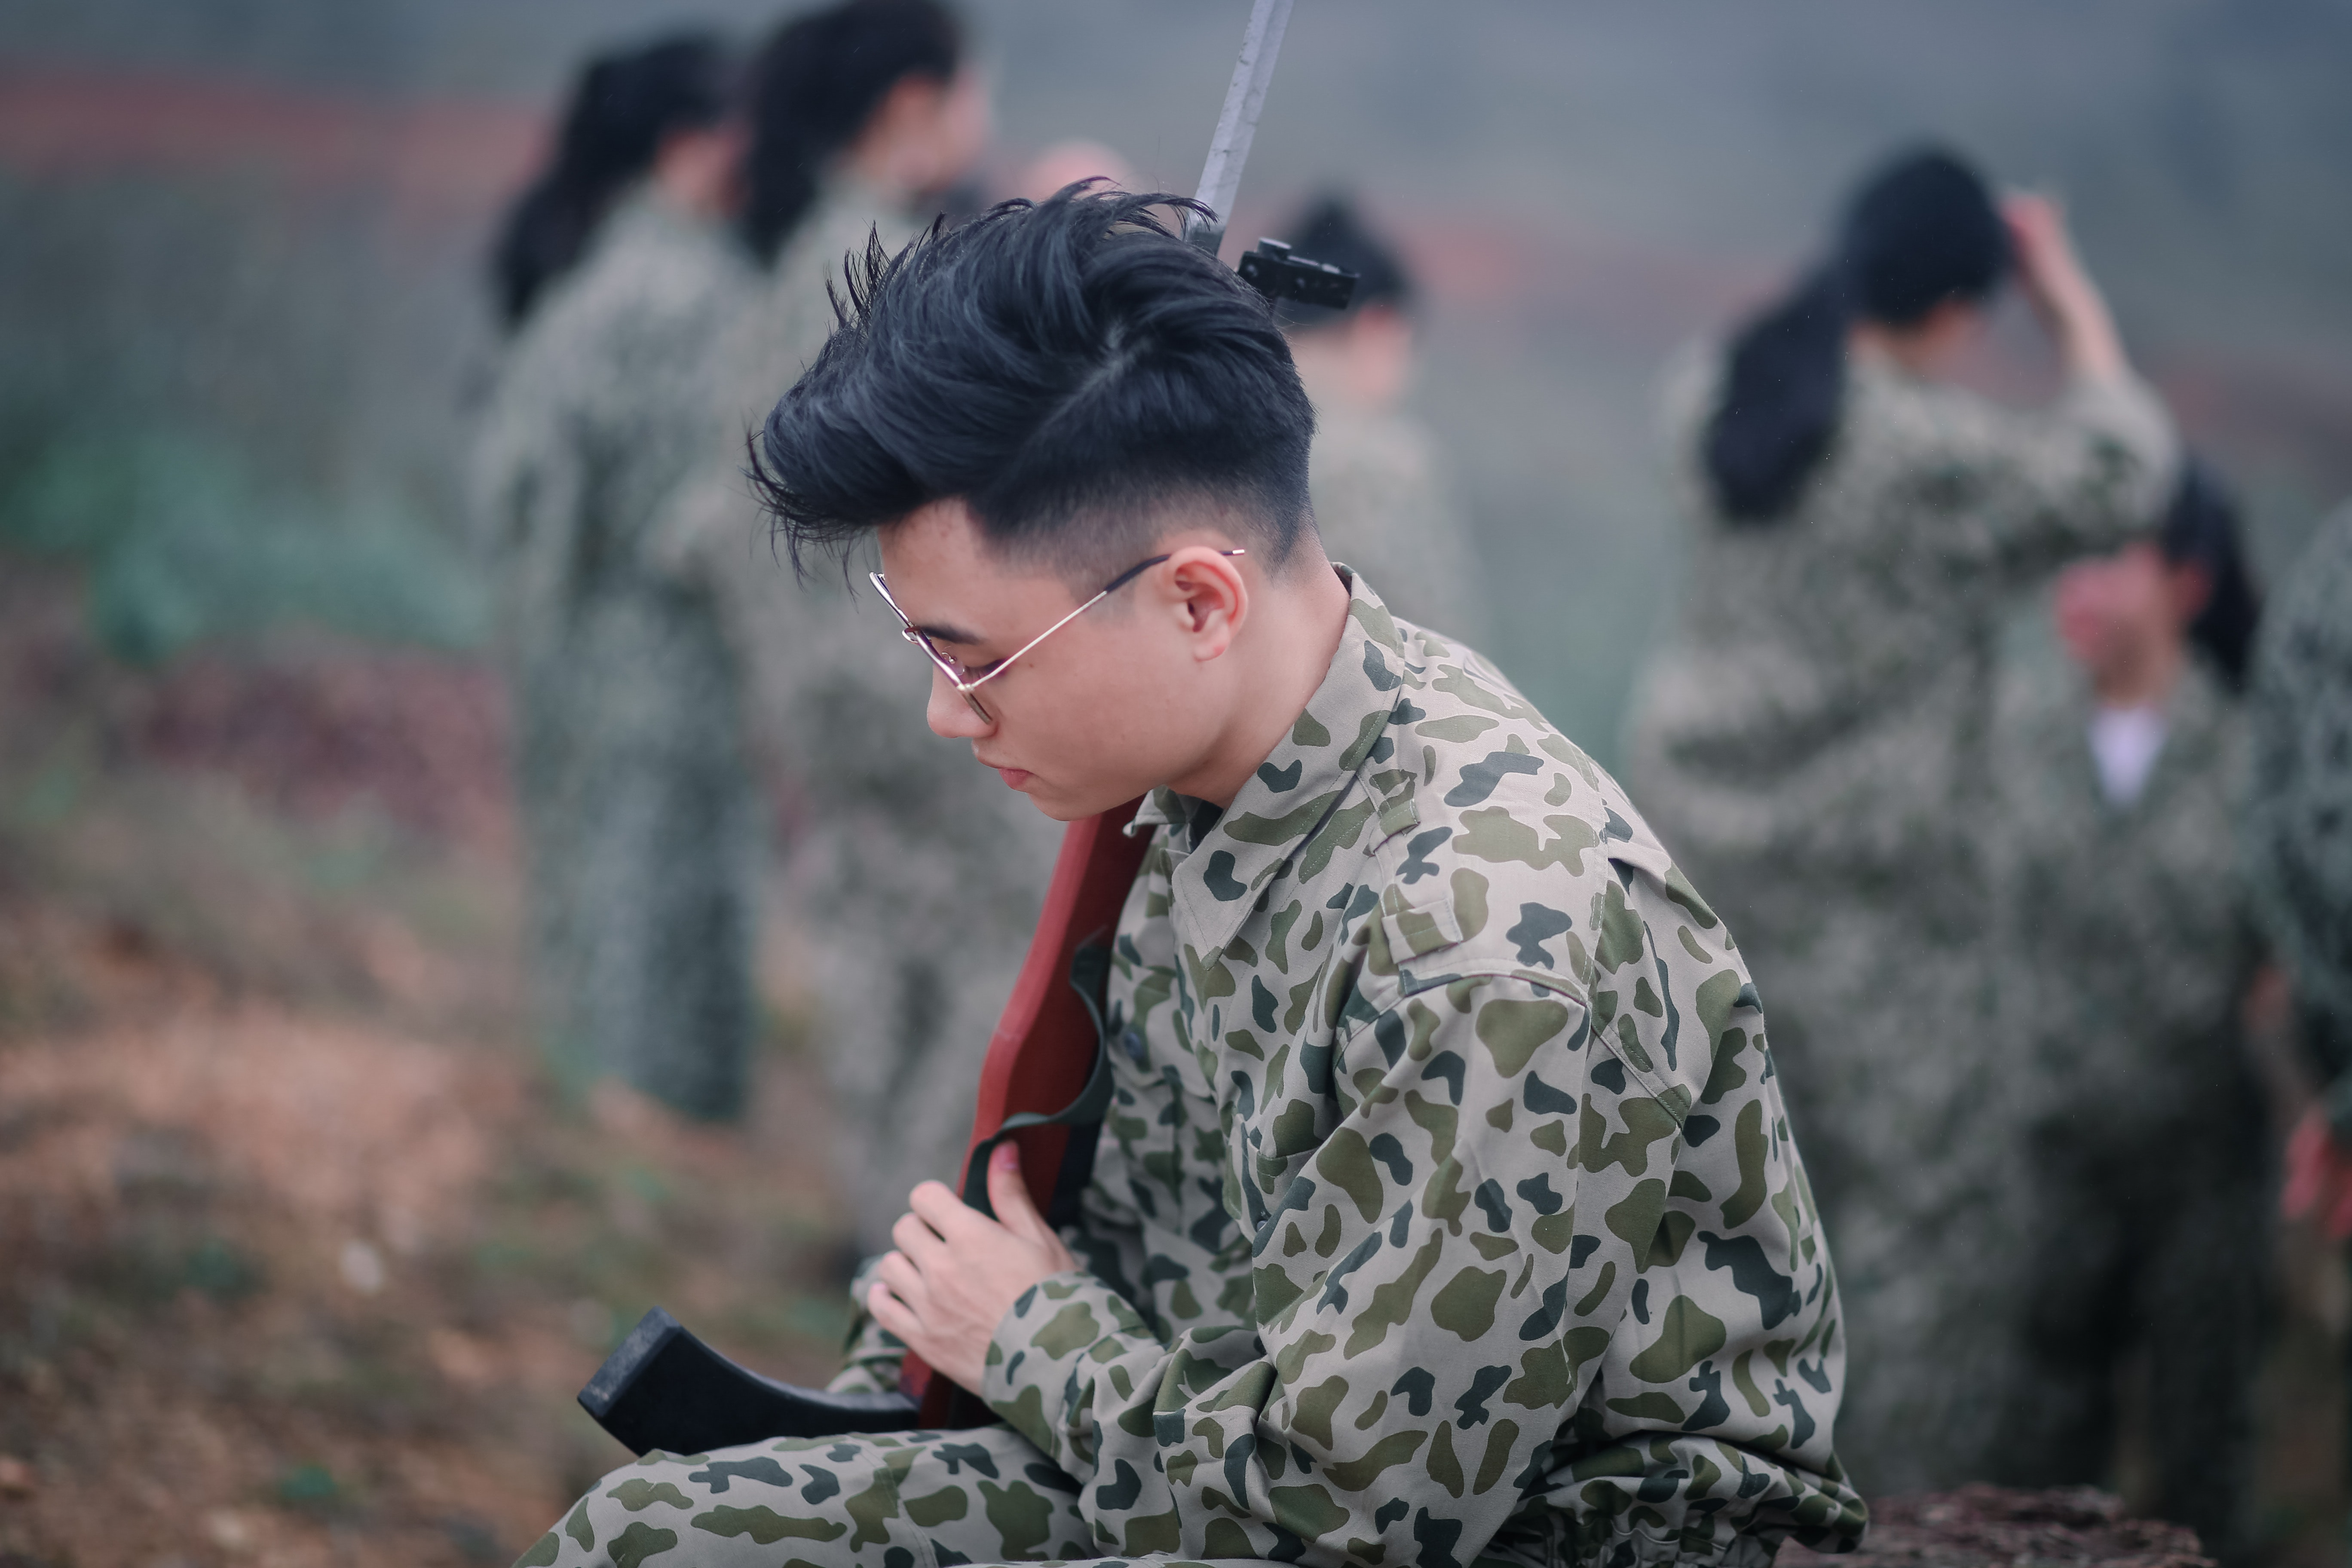 Man Wearing Sunglasses Holding Rifle, Army, Boy, Man, Military, HQ Photo